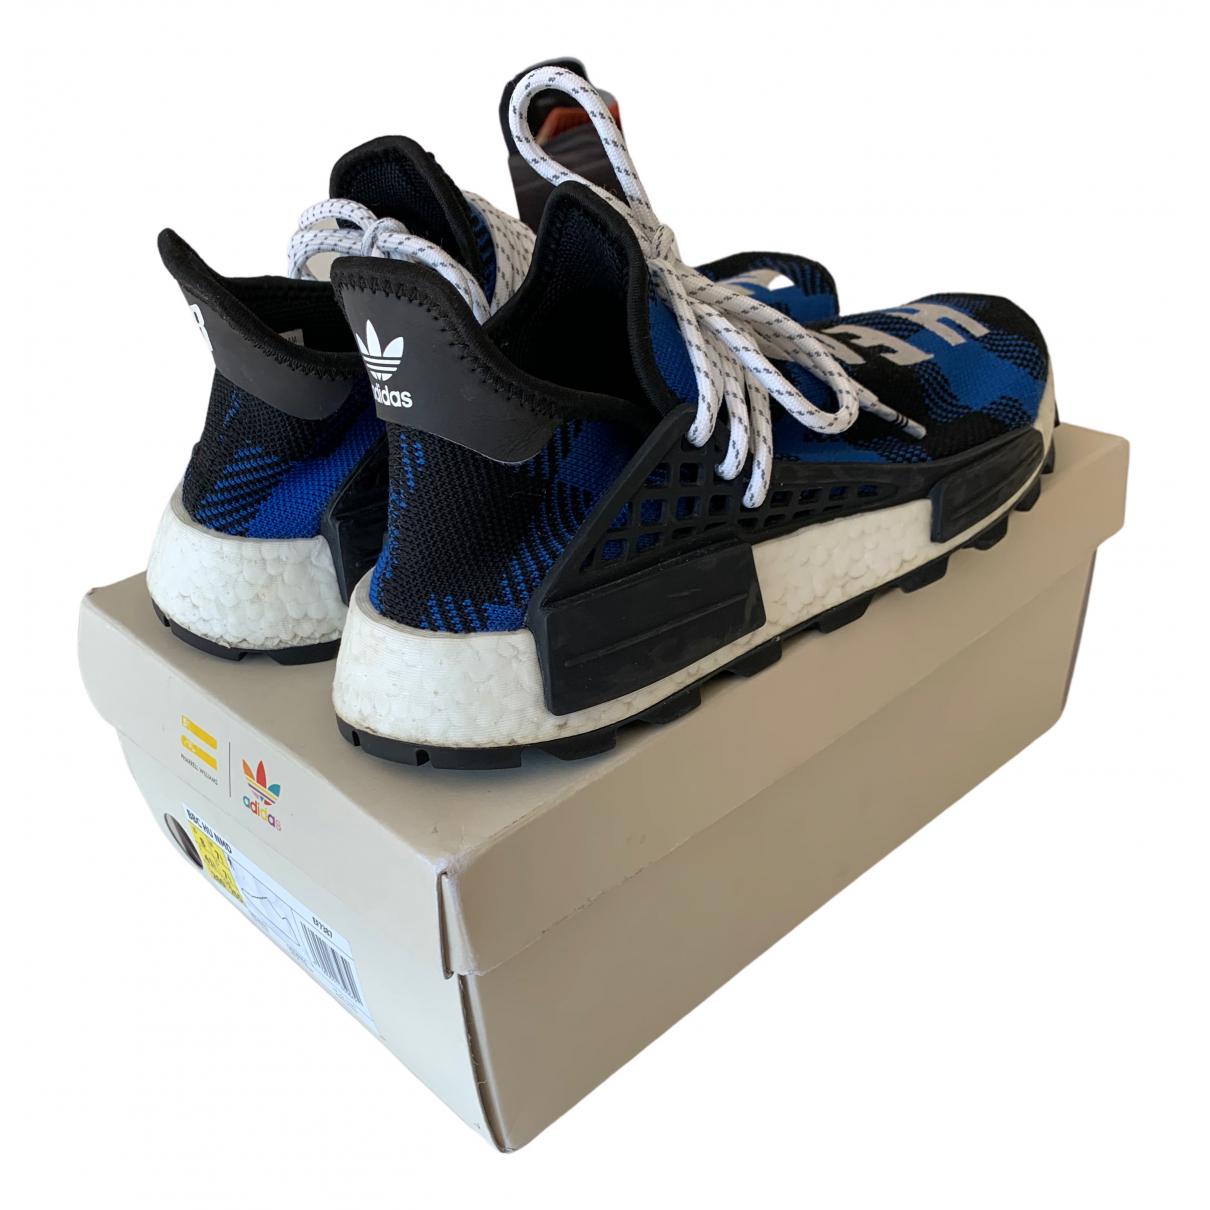 Adidas X Pharrell Williams - Baskets NMD Hu pour homme en autre - bleu